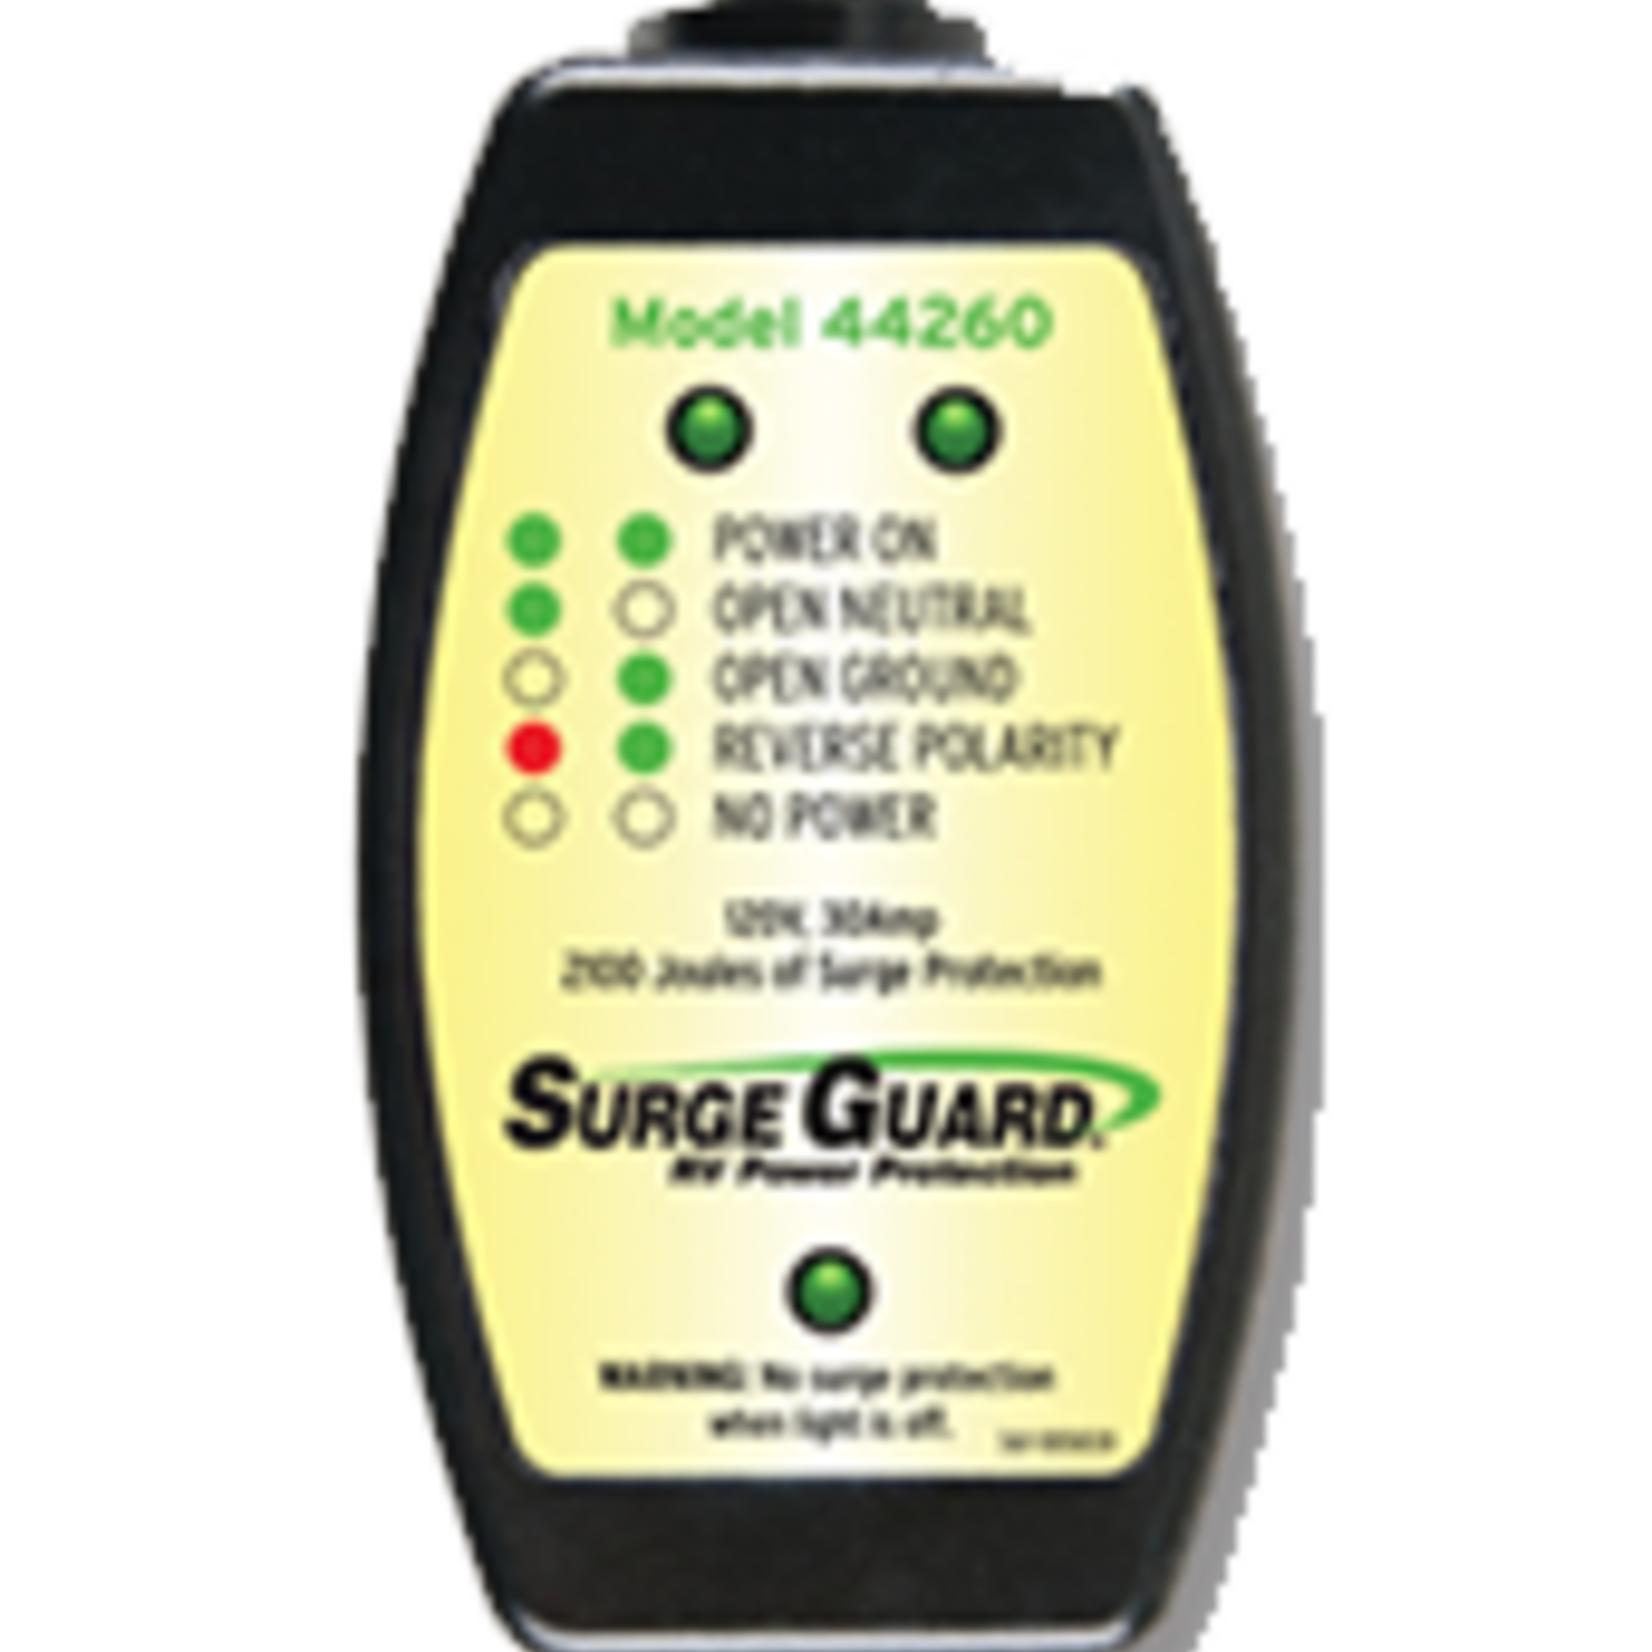 Easy-T-Pull™ Plug Handle Surge Guard* 30A – Model  44260